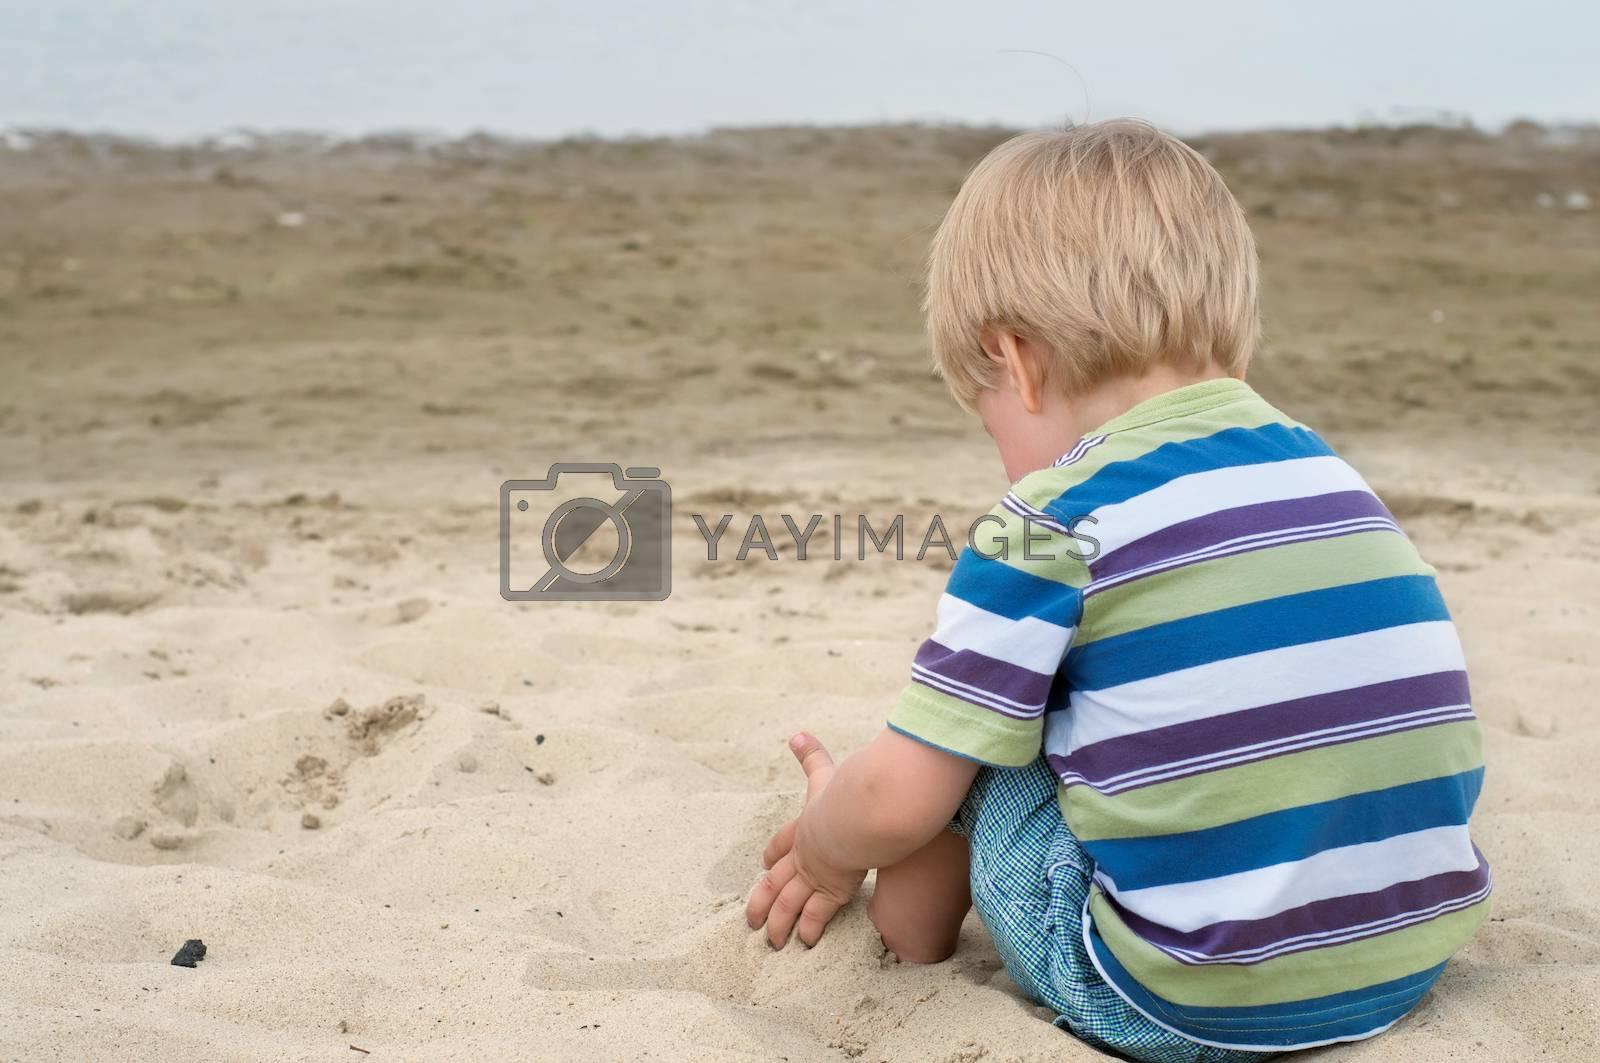 Little toddler boy in striped t-shirt sitting back on sandy beach